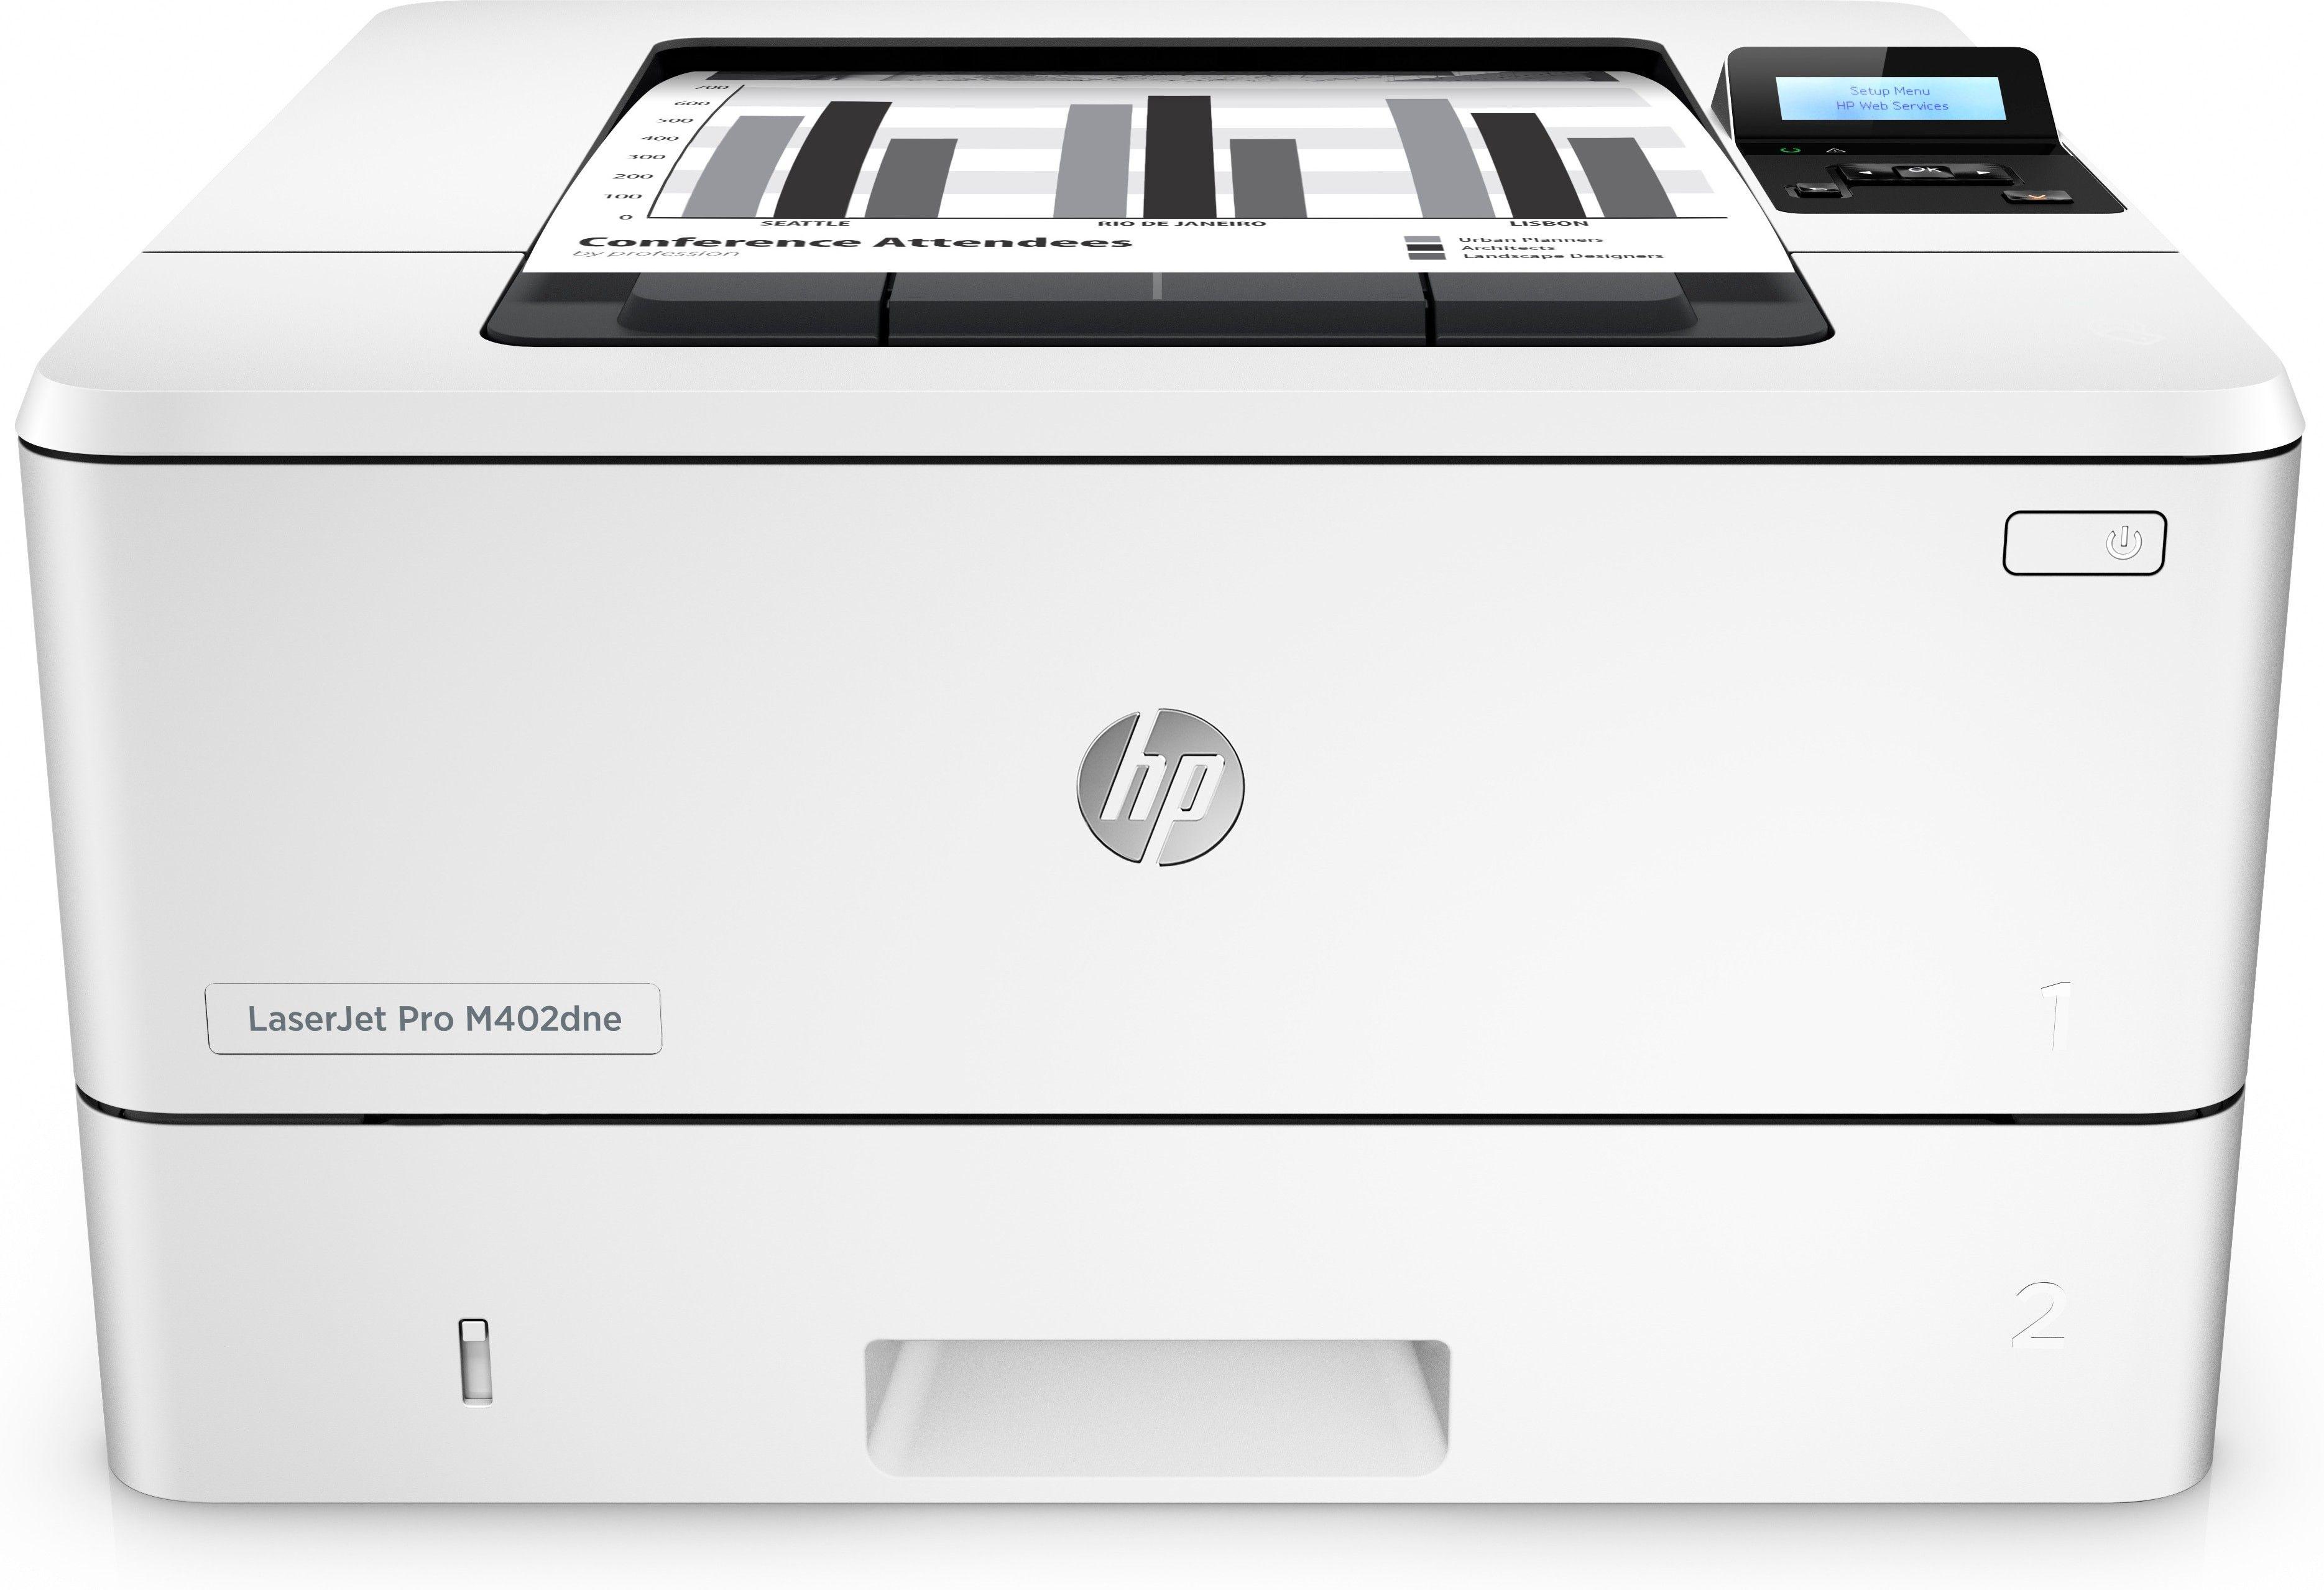 Hp Laserjet Pro M402dne 1200 X 1200dpi A4 199 00 Printers Hp Free Delivery All Over Cyprus Follow Us Laser Printer Black And White Printer Printer